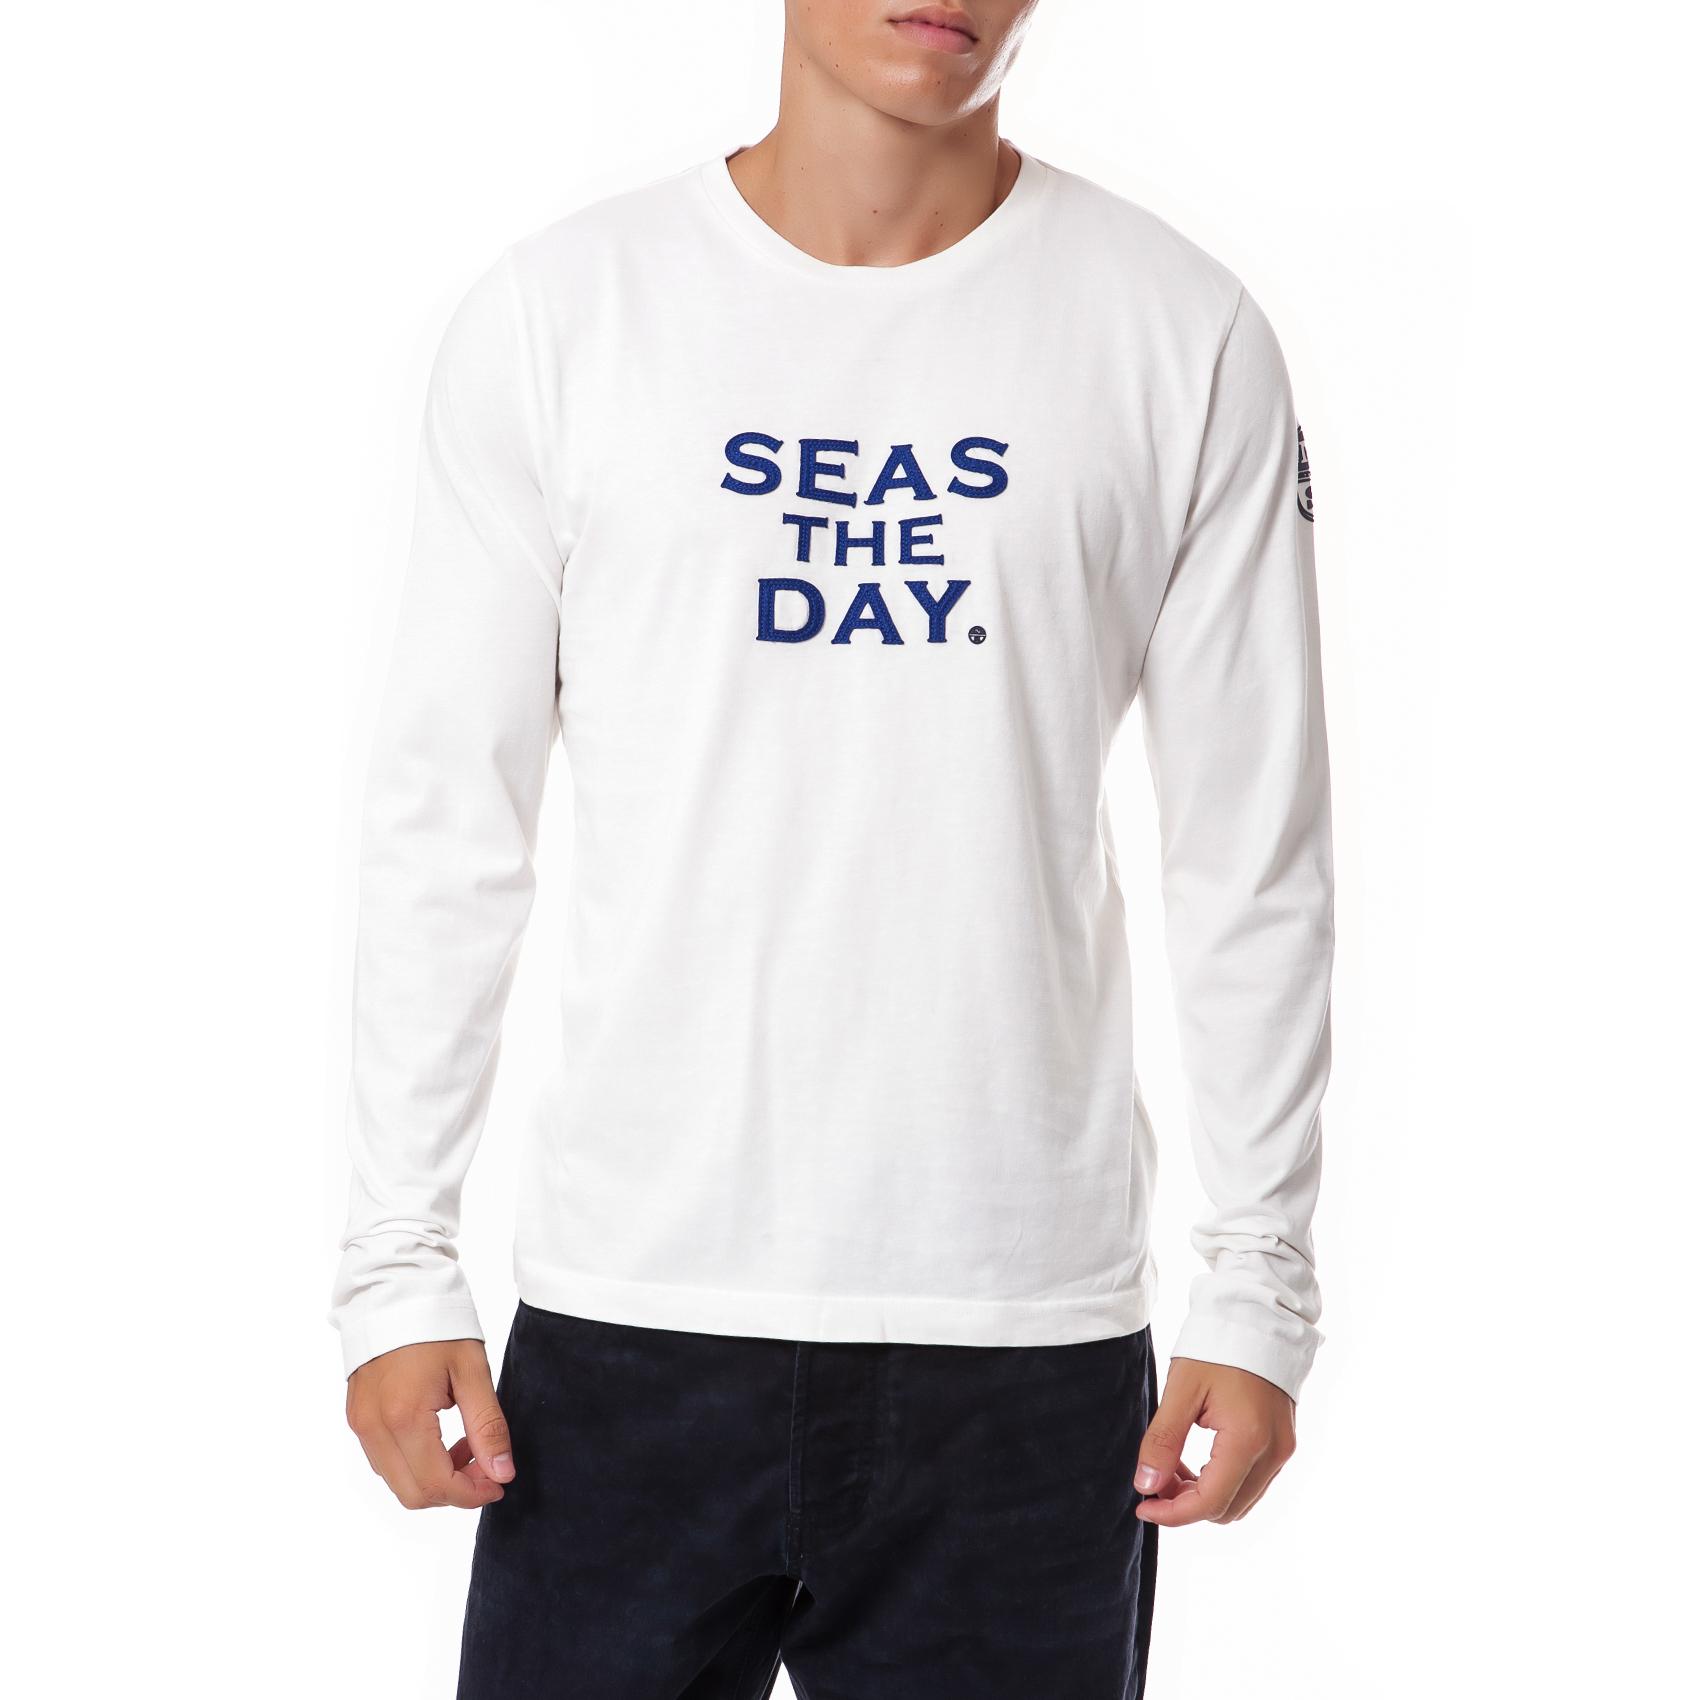 NORTH SAILS - Ανδρική μπλούζα North Sails εκρού